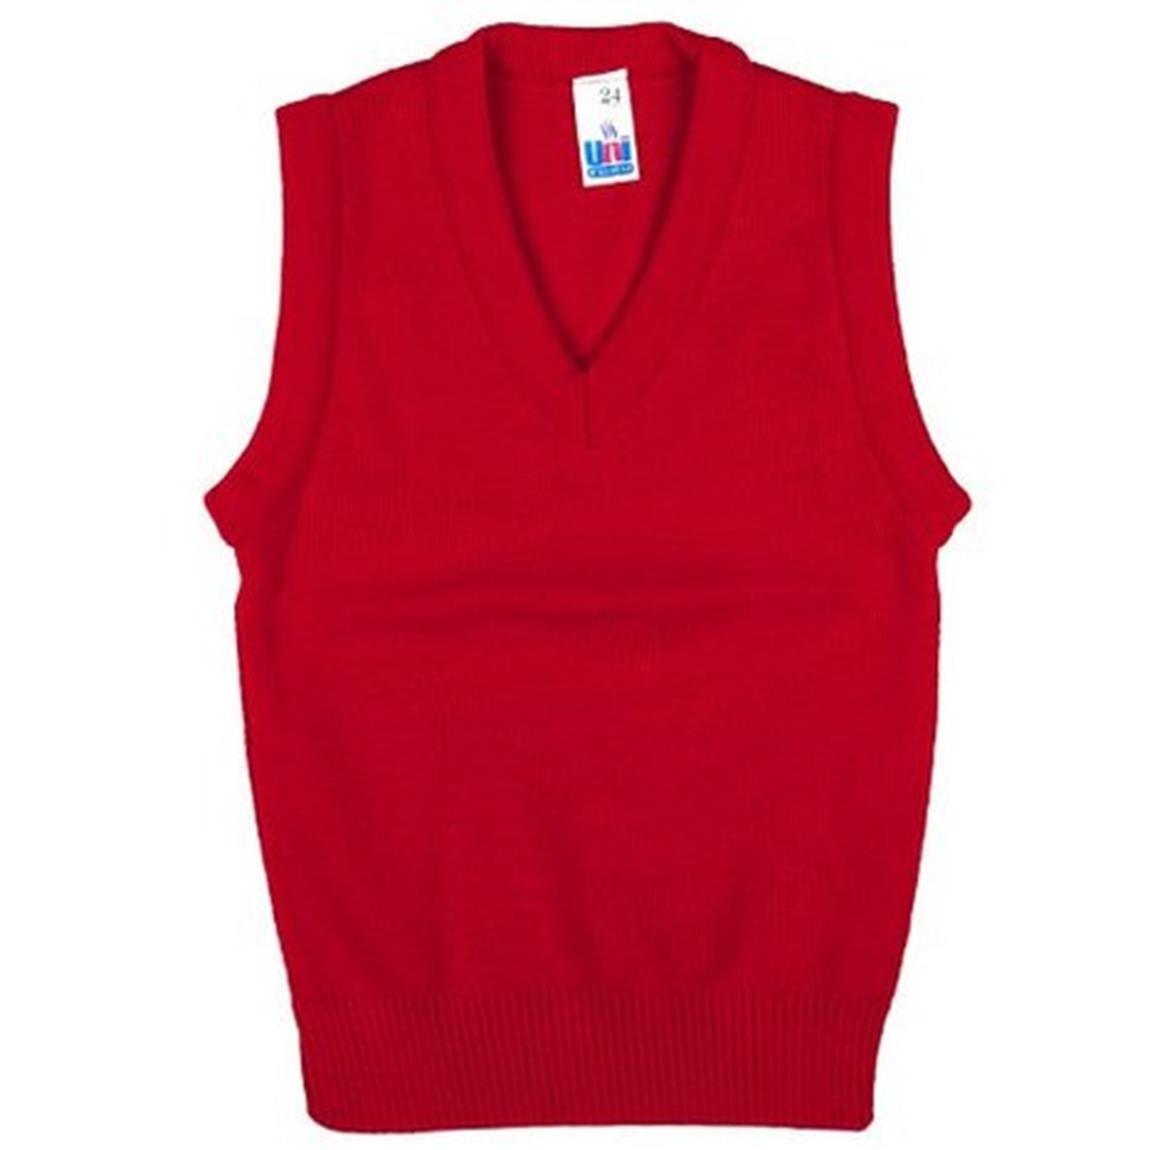 Only Uniform Unisex School Uniform V Neck Tank Top Sleeveless Jumper Size 2yr-XL Unique